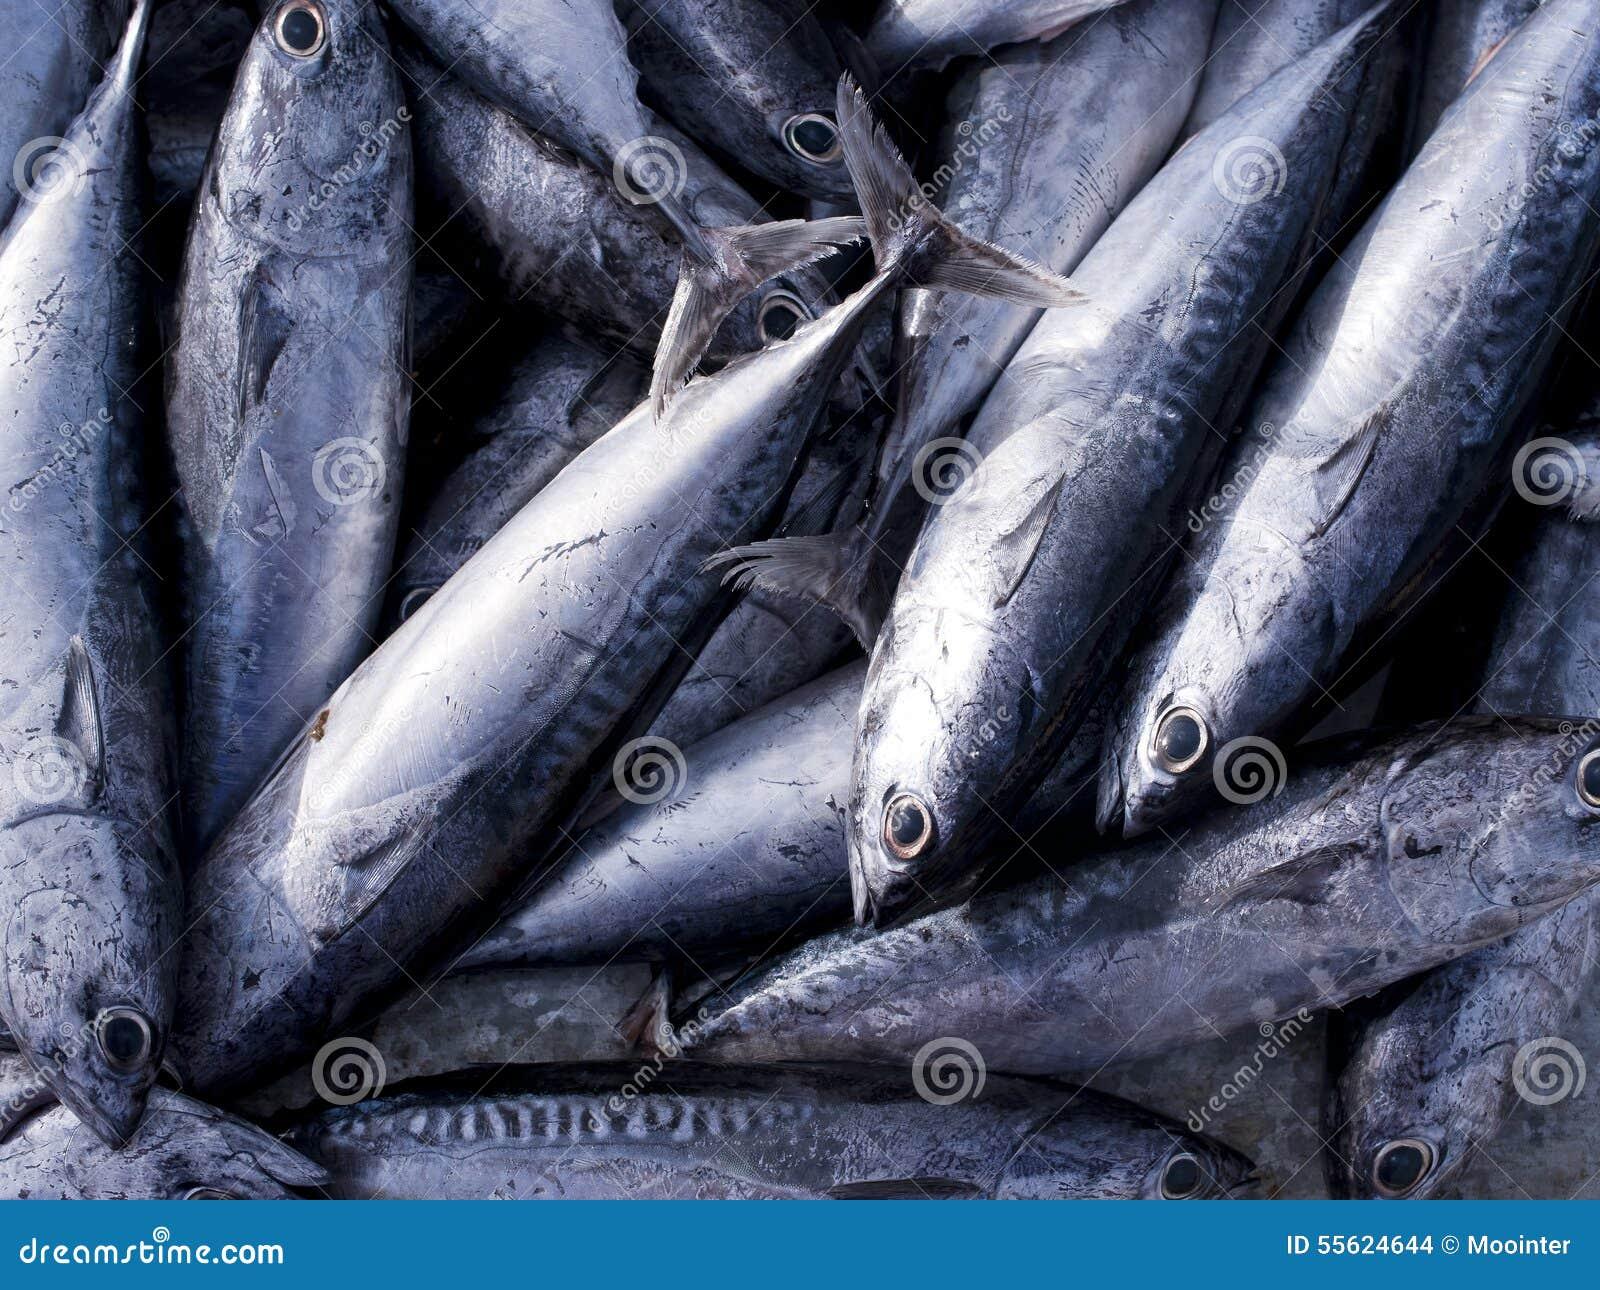 Eastern little tuna - photo#51